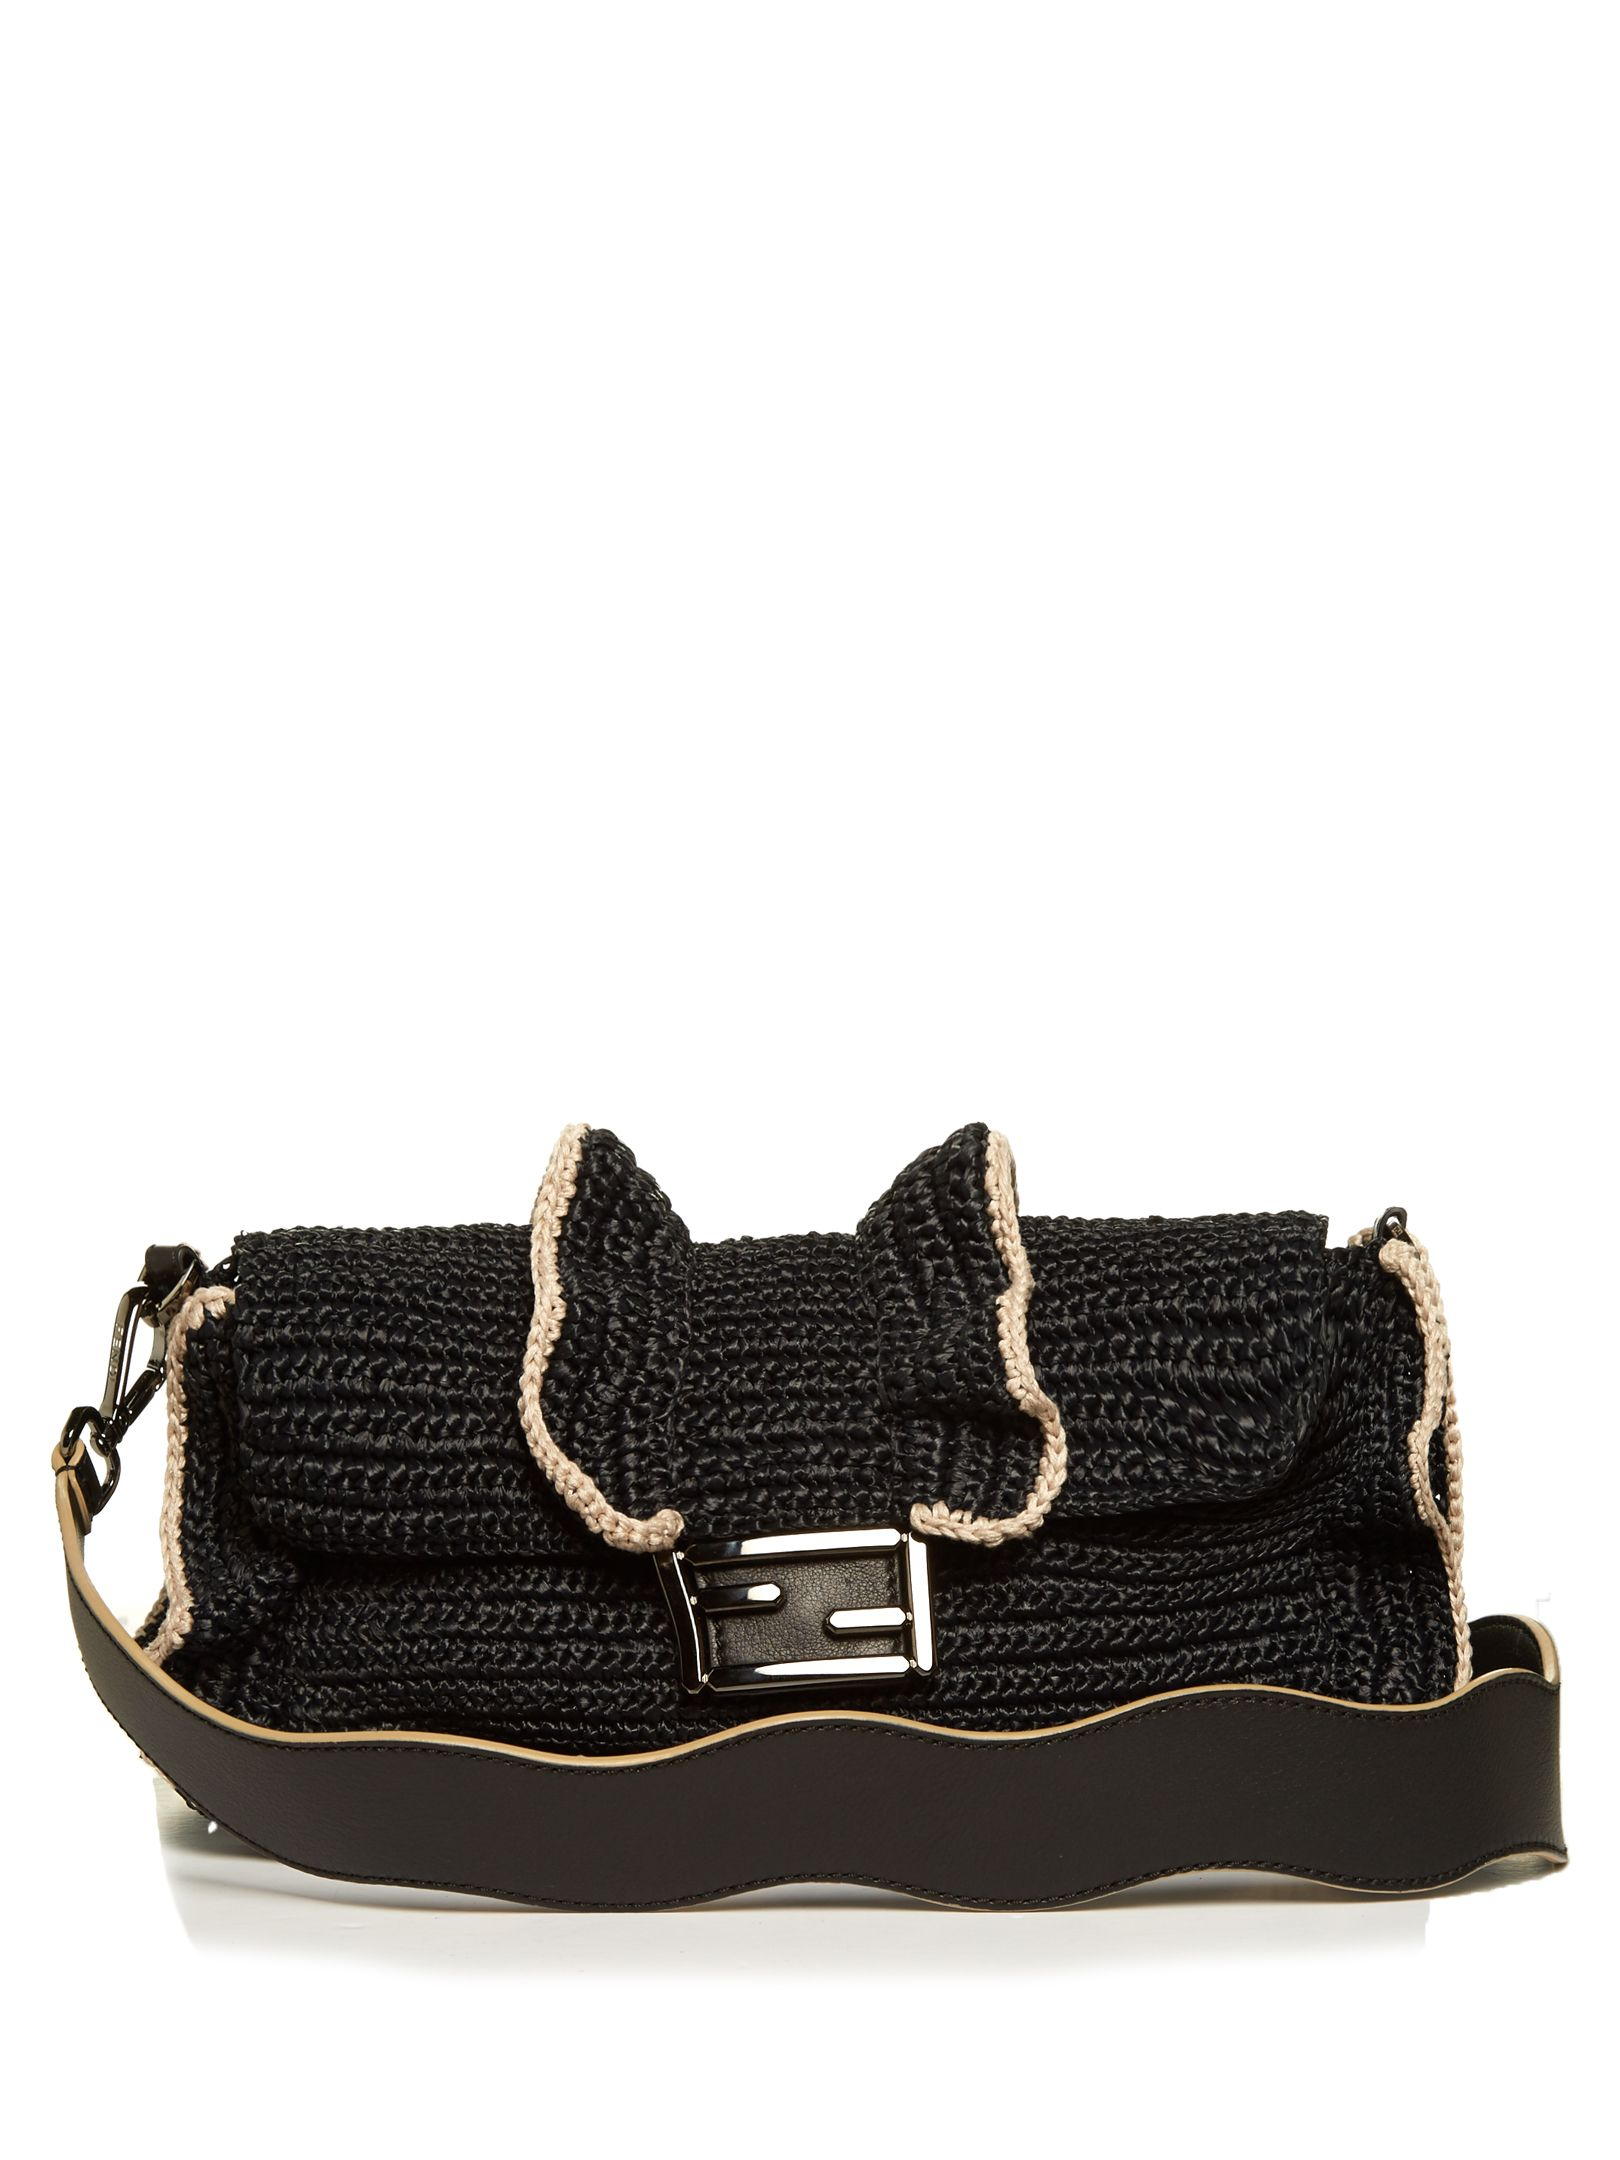 df665a7f4264 Click here to buy Fendi Baguette Wave raffia cross-body bag at  MATCHESFASHION.COM